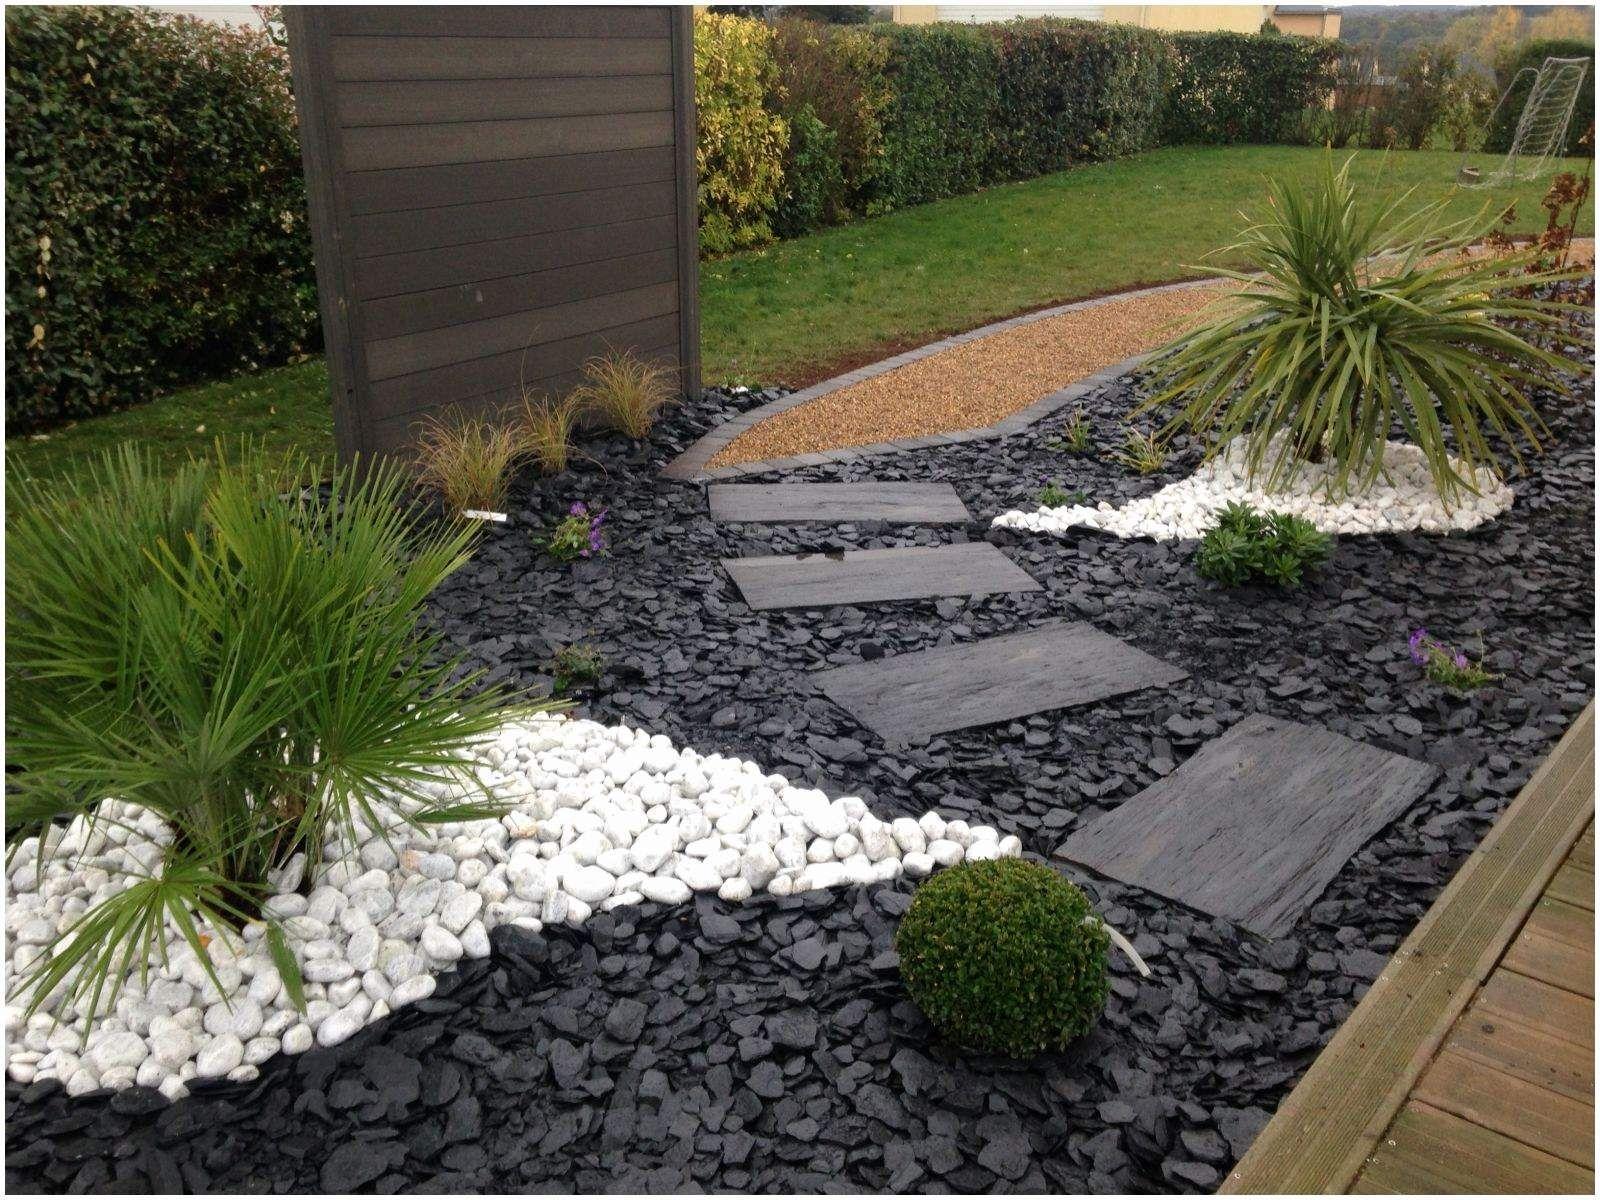 Idee Deco Jardin Avec Gravier Amenagement Jardin Idee Deco